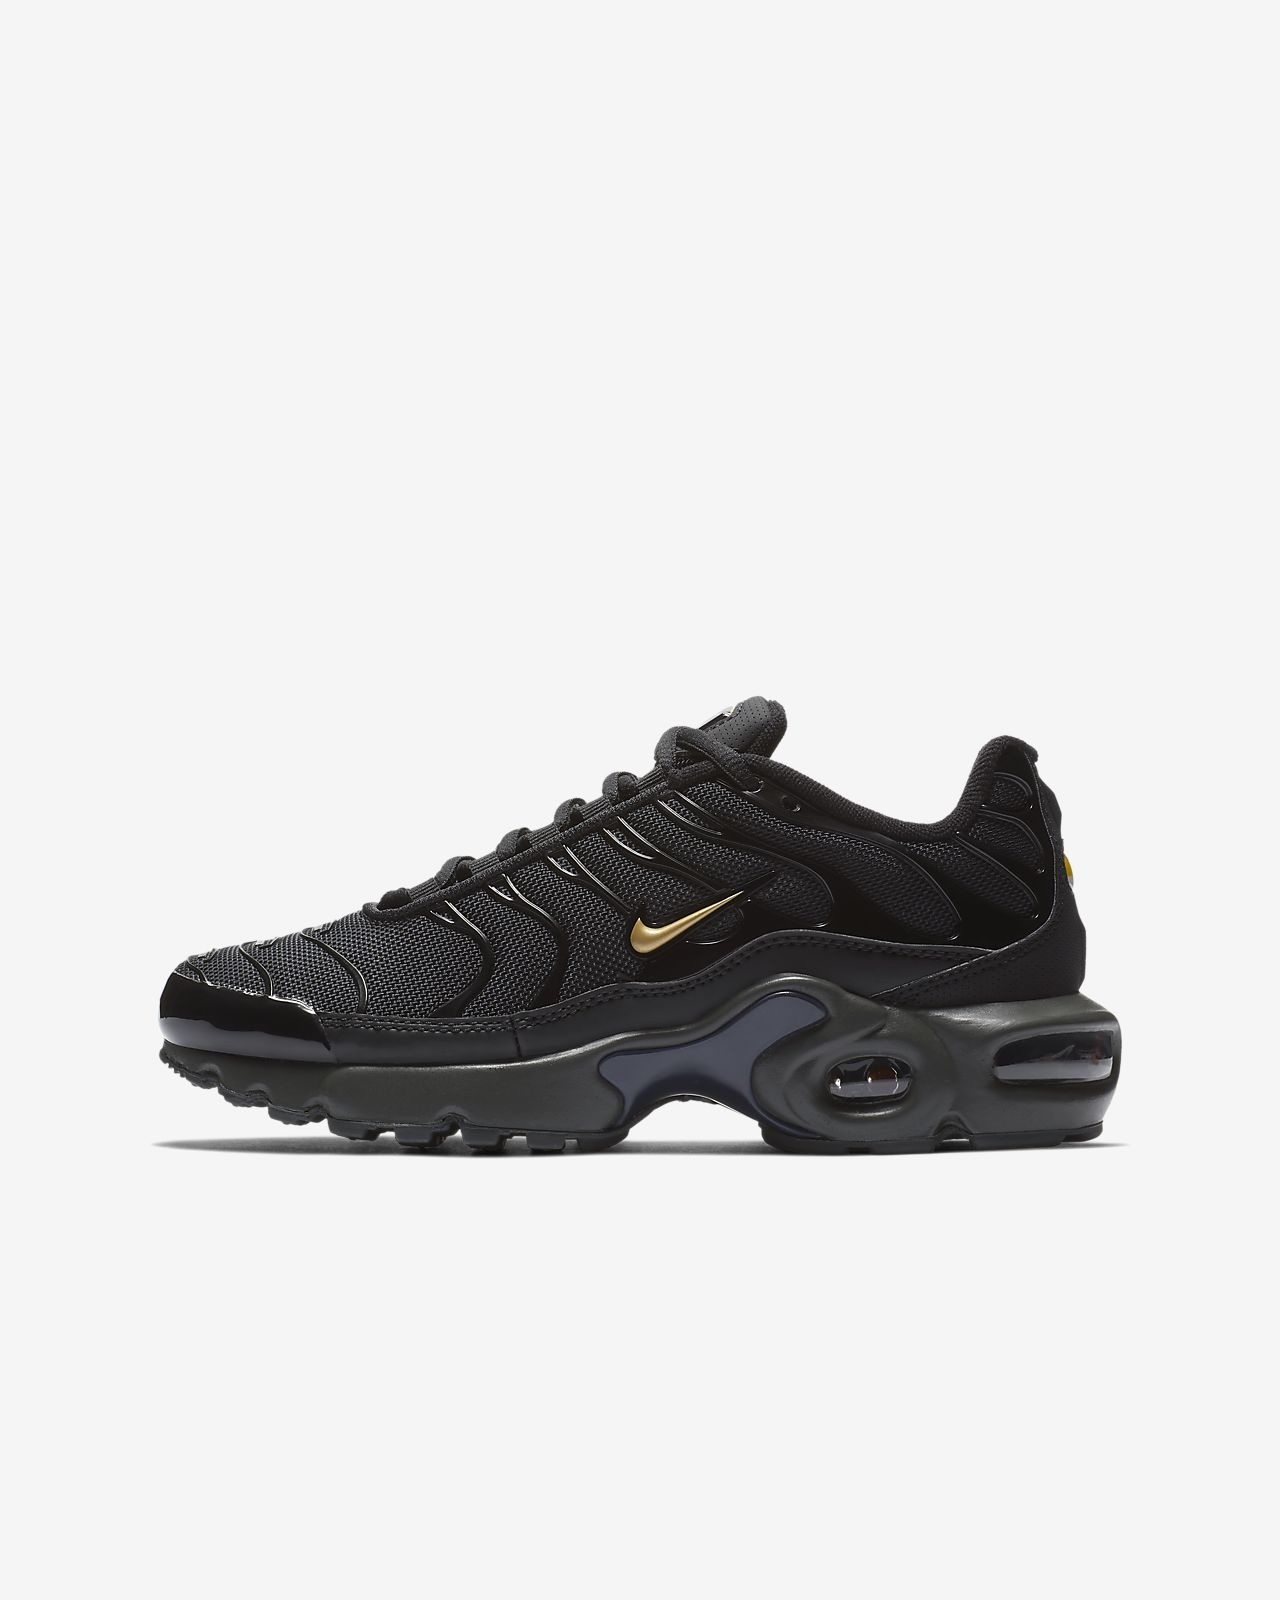 Nike Air Max Plus TN SE Older Kids' Shoe